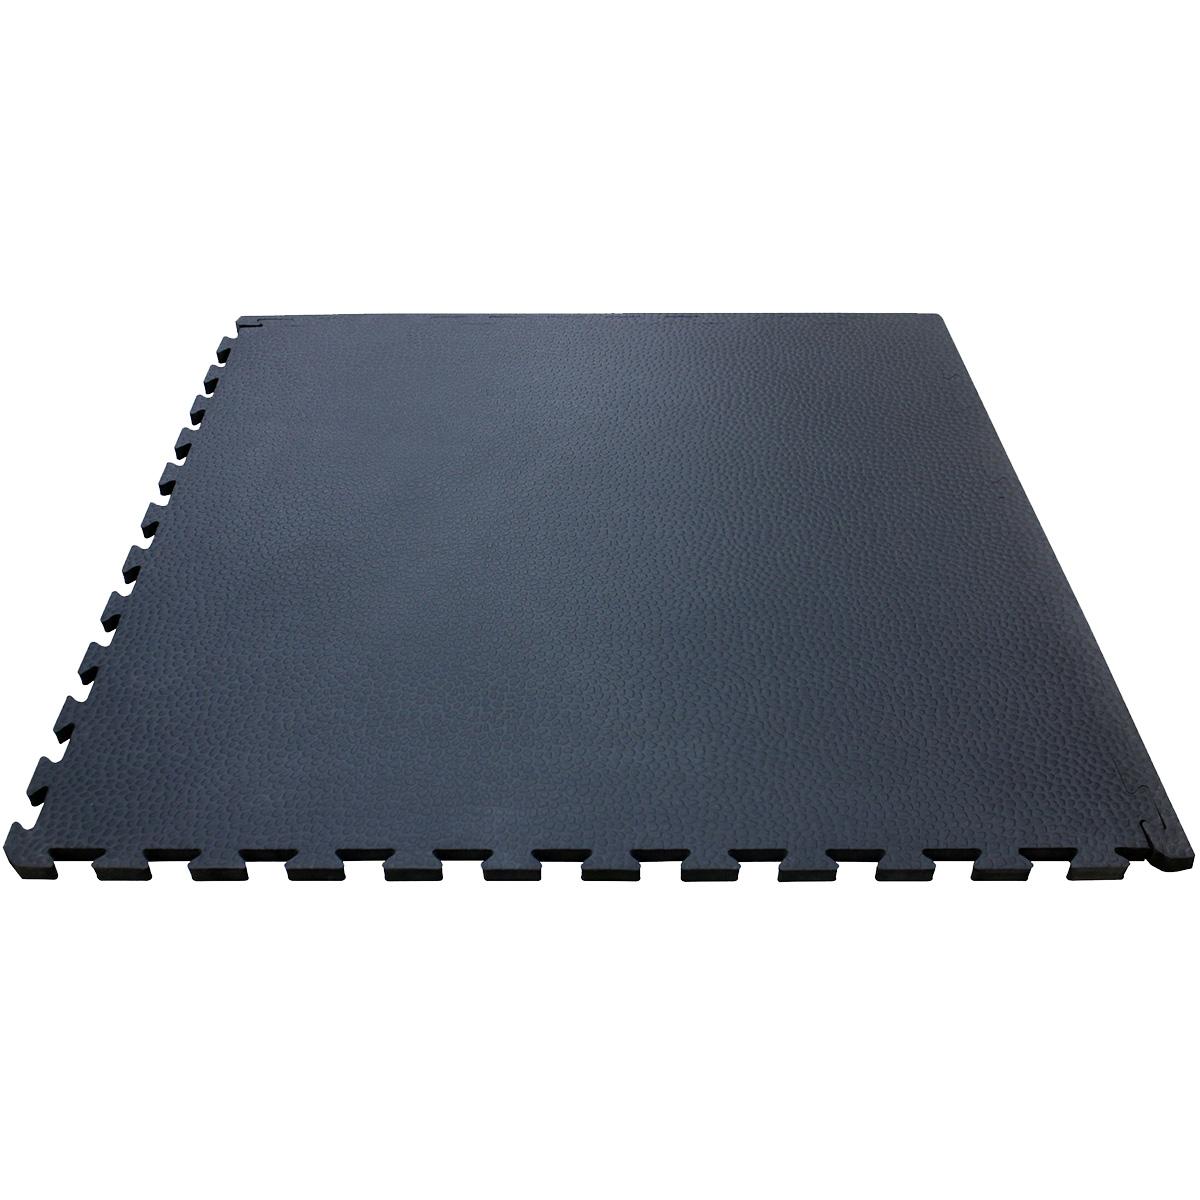 4Fighter Cross Stone Mat Bodenschutzmatte schwarz 100 x 100 x 1 cm